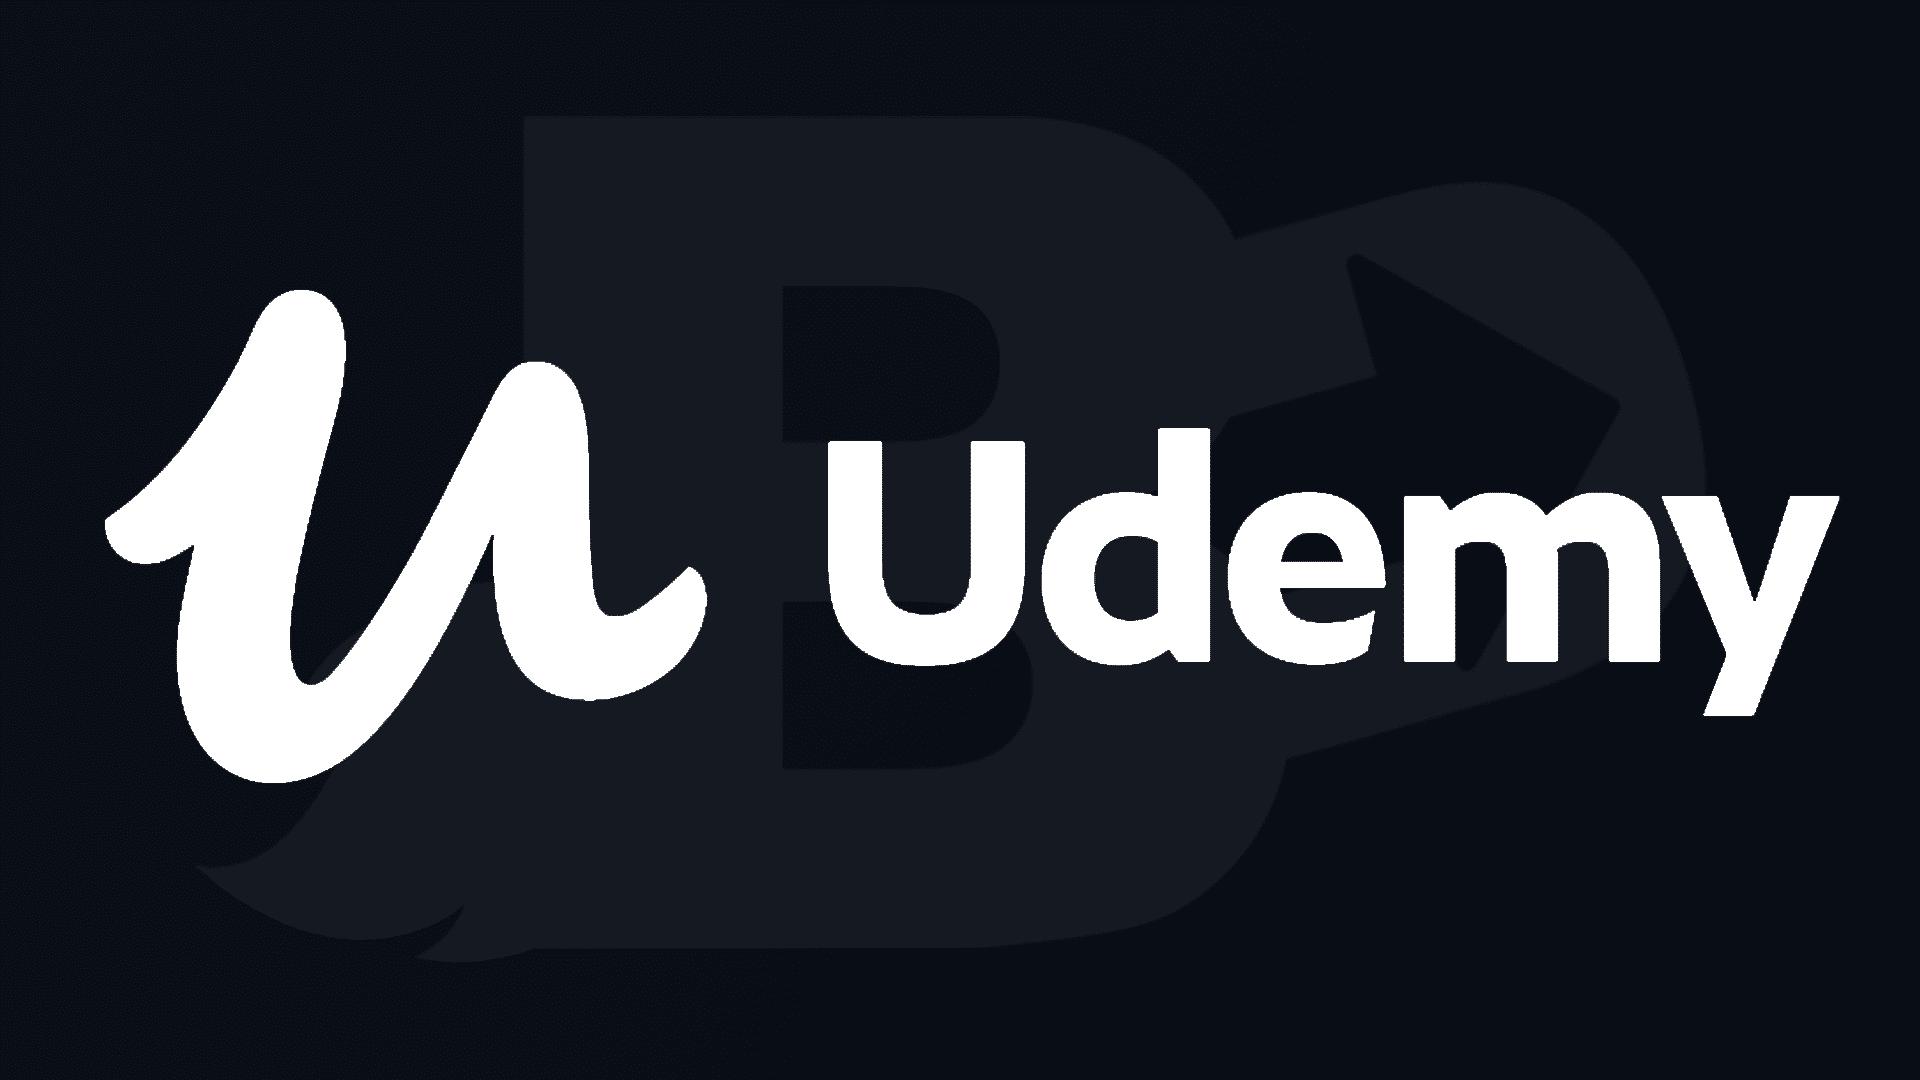 Formation Udemy en dropshipping, seo, snapchat, instagram et publicité facebook.